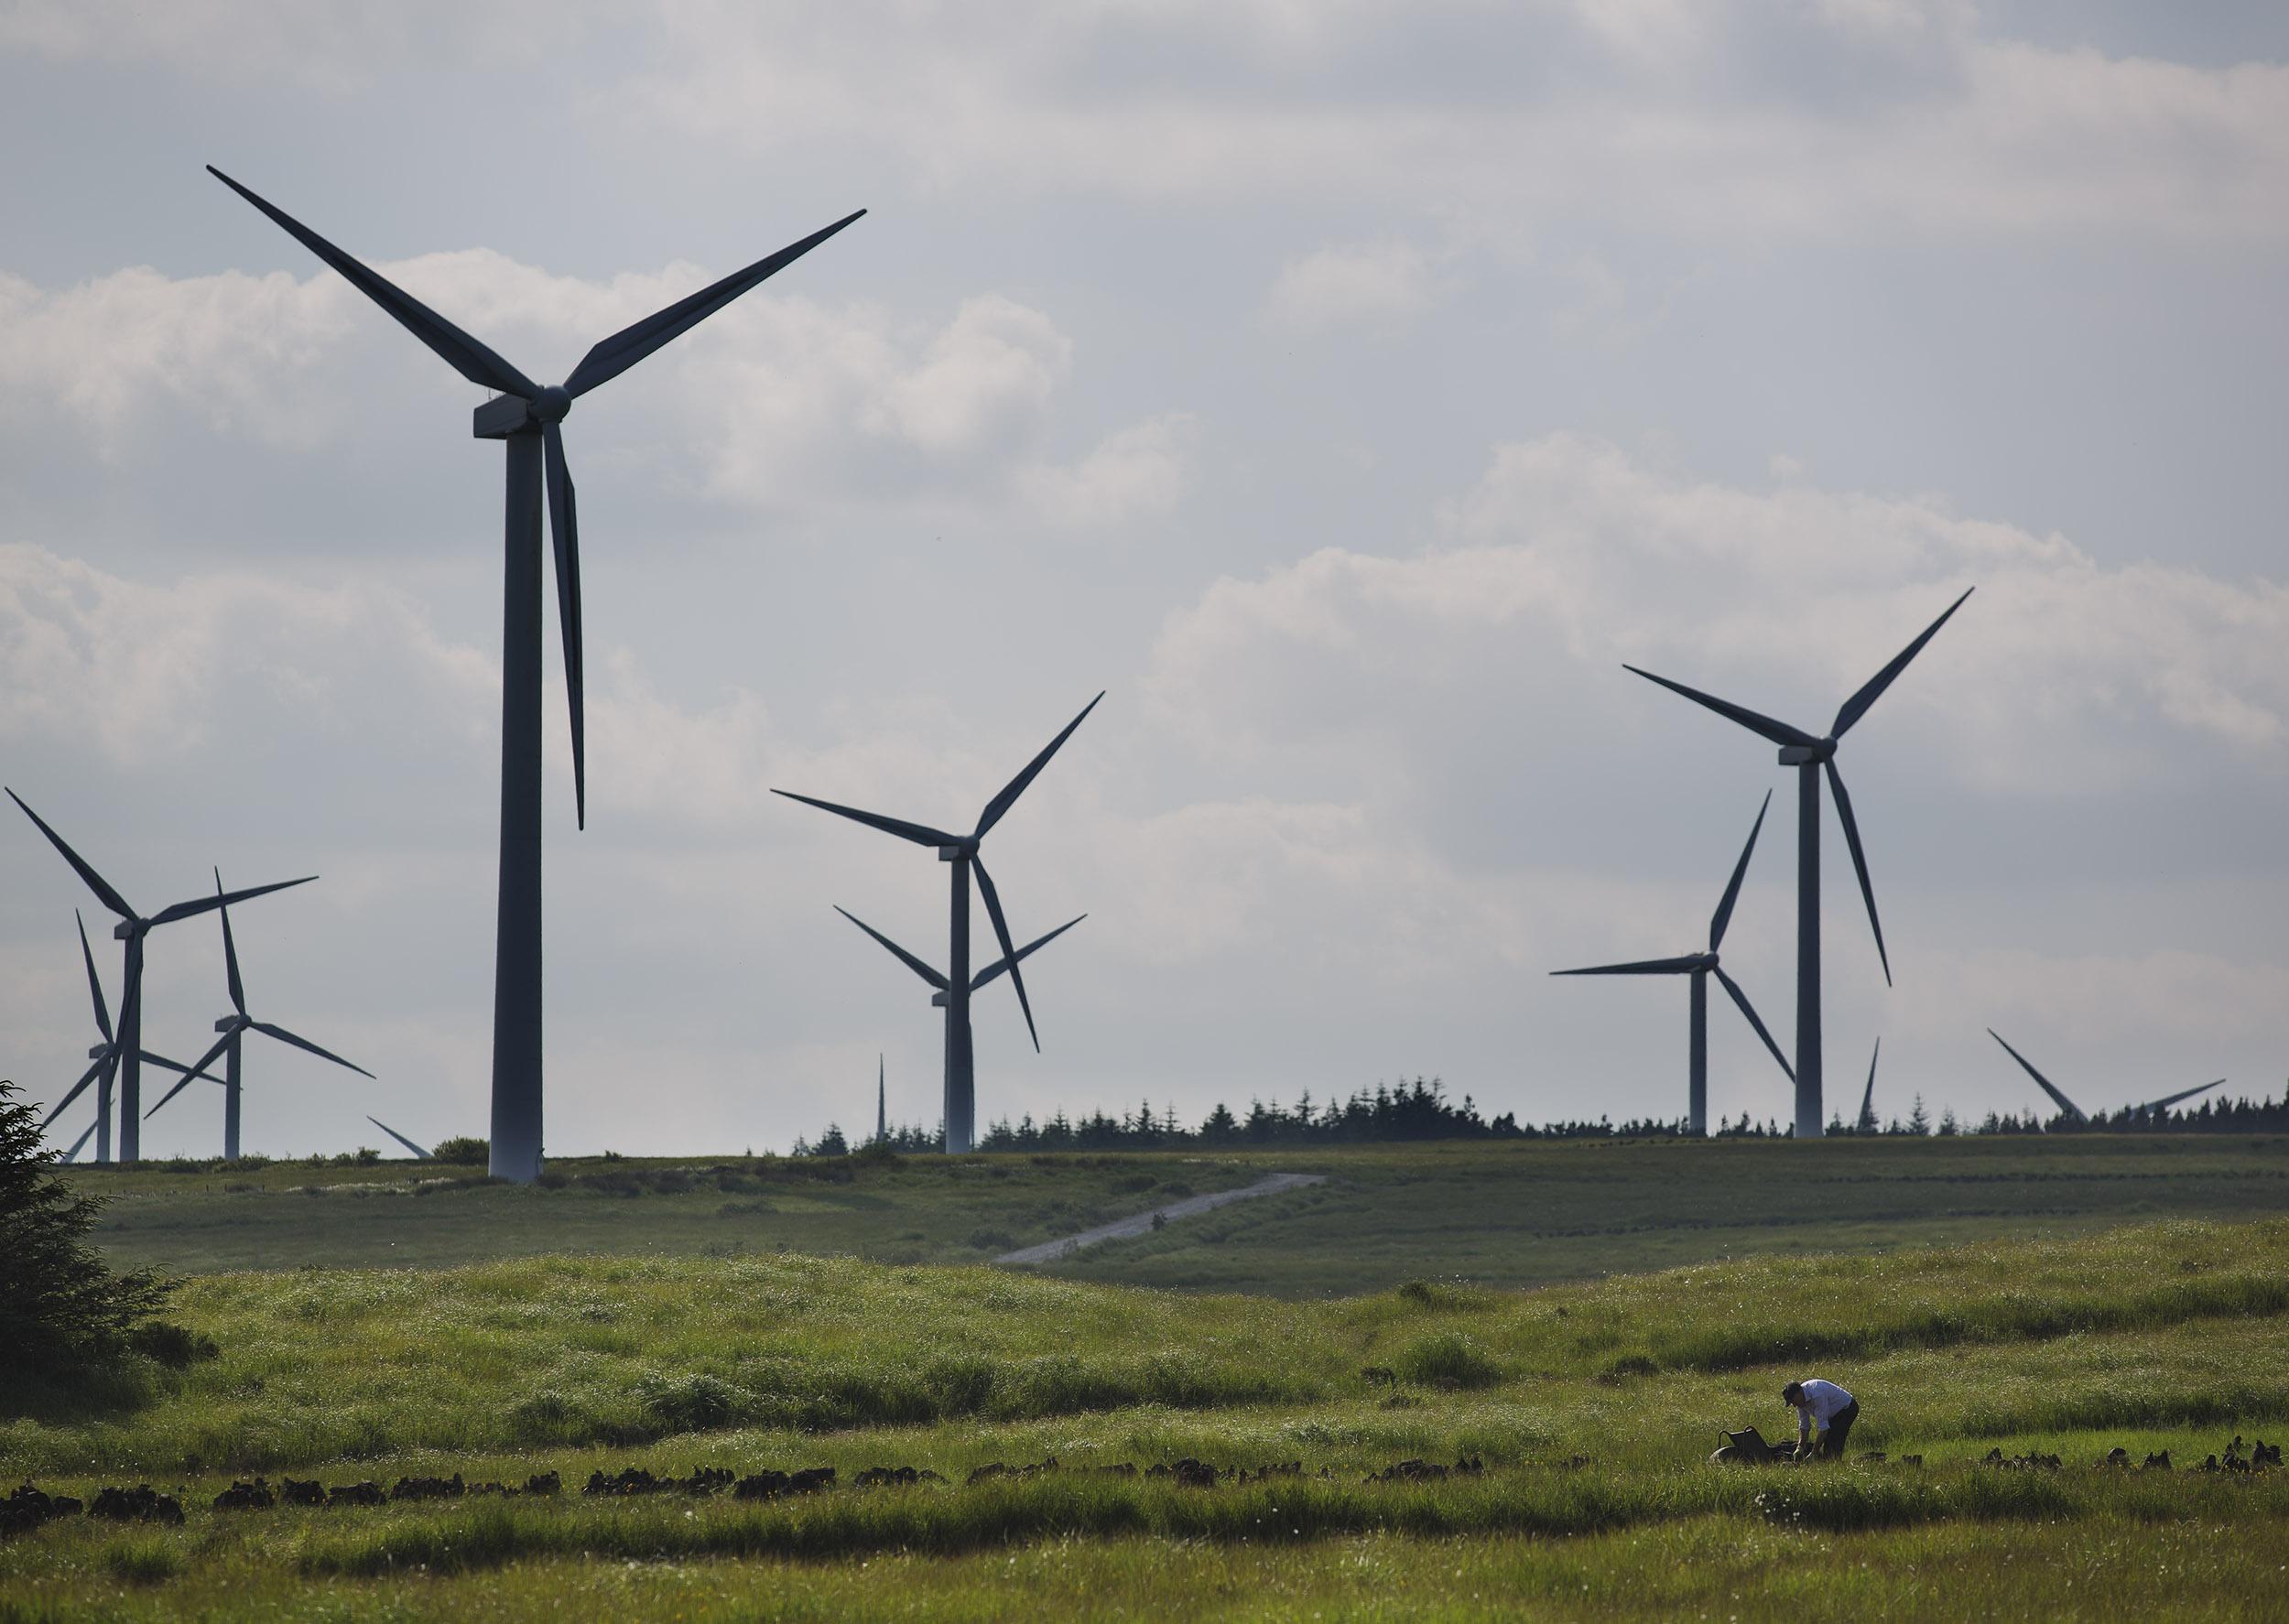 Landscape-Wind-Turbine-Turf-Cutter-Bolger-Photography.jpg